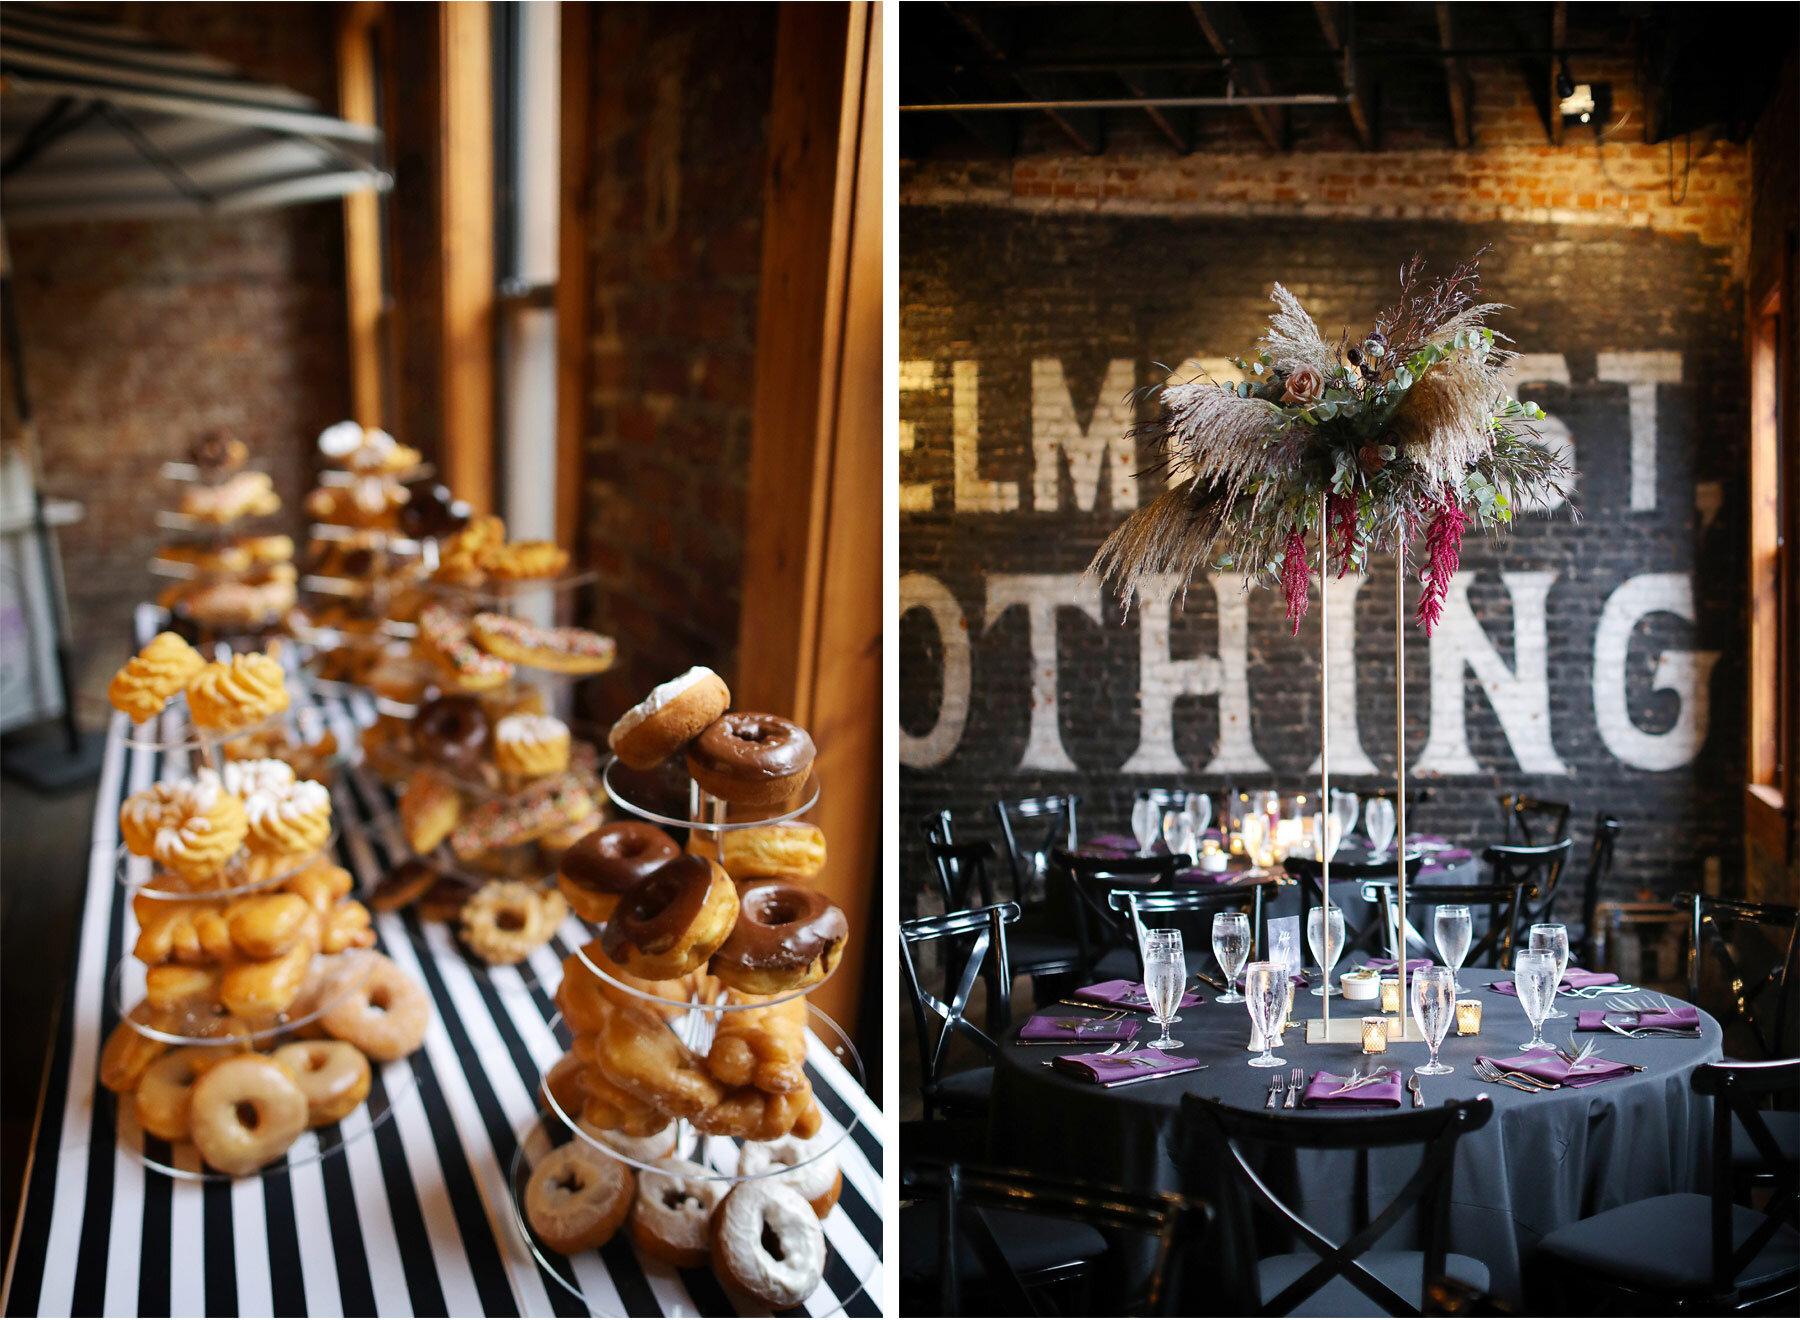 13-Vick-Photography-Wedding-Minneapolis-Minnesota-Earl-and-Wilson-Donuts-Danielle-and-Tom.jpg